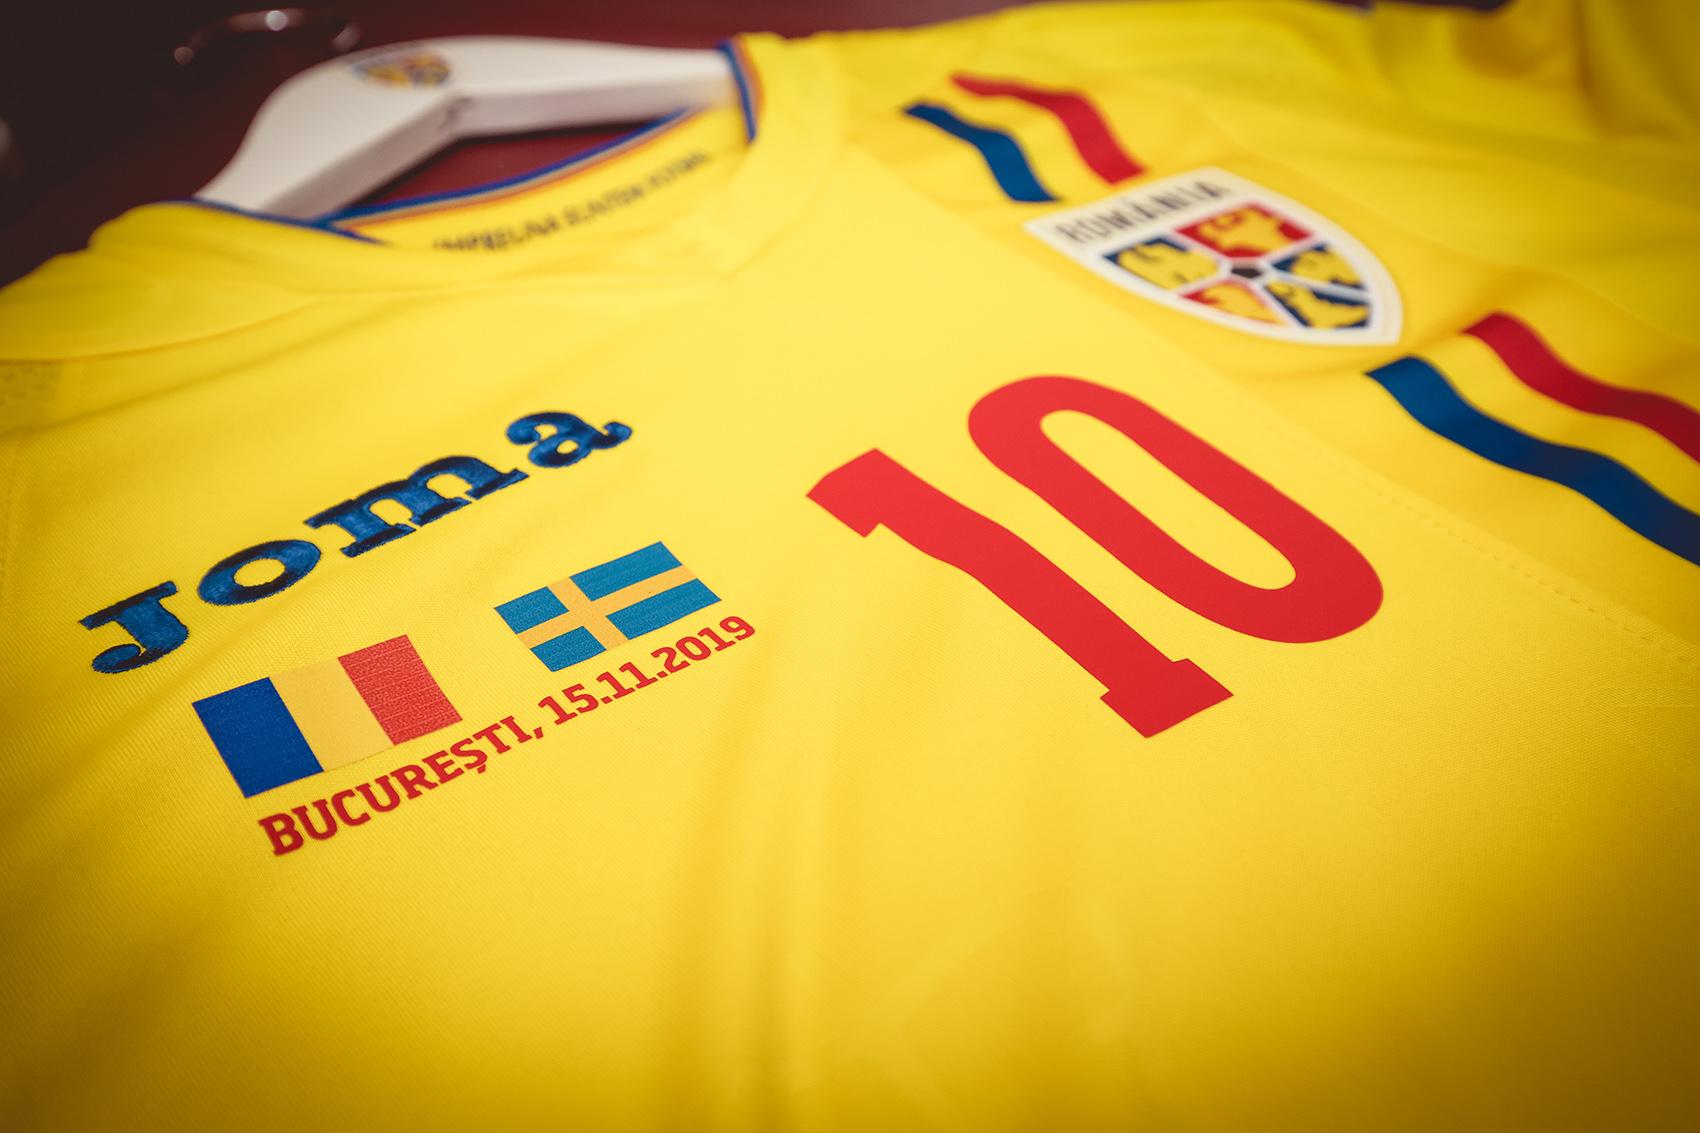 BREAKING NEWS: cu cine jucam in play-off-ul Euro 2020!